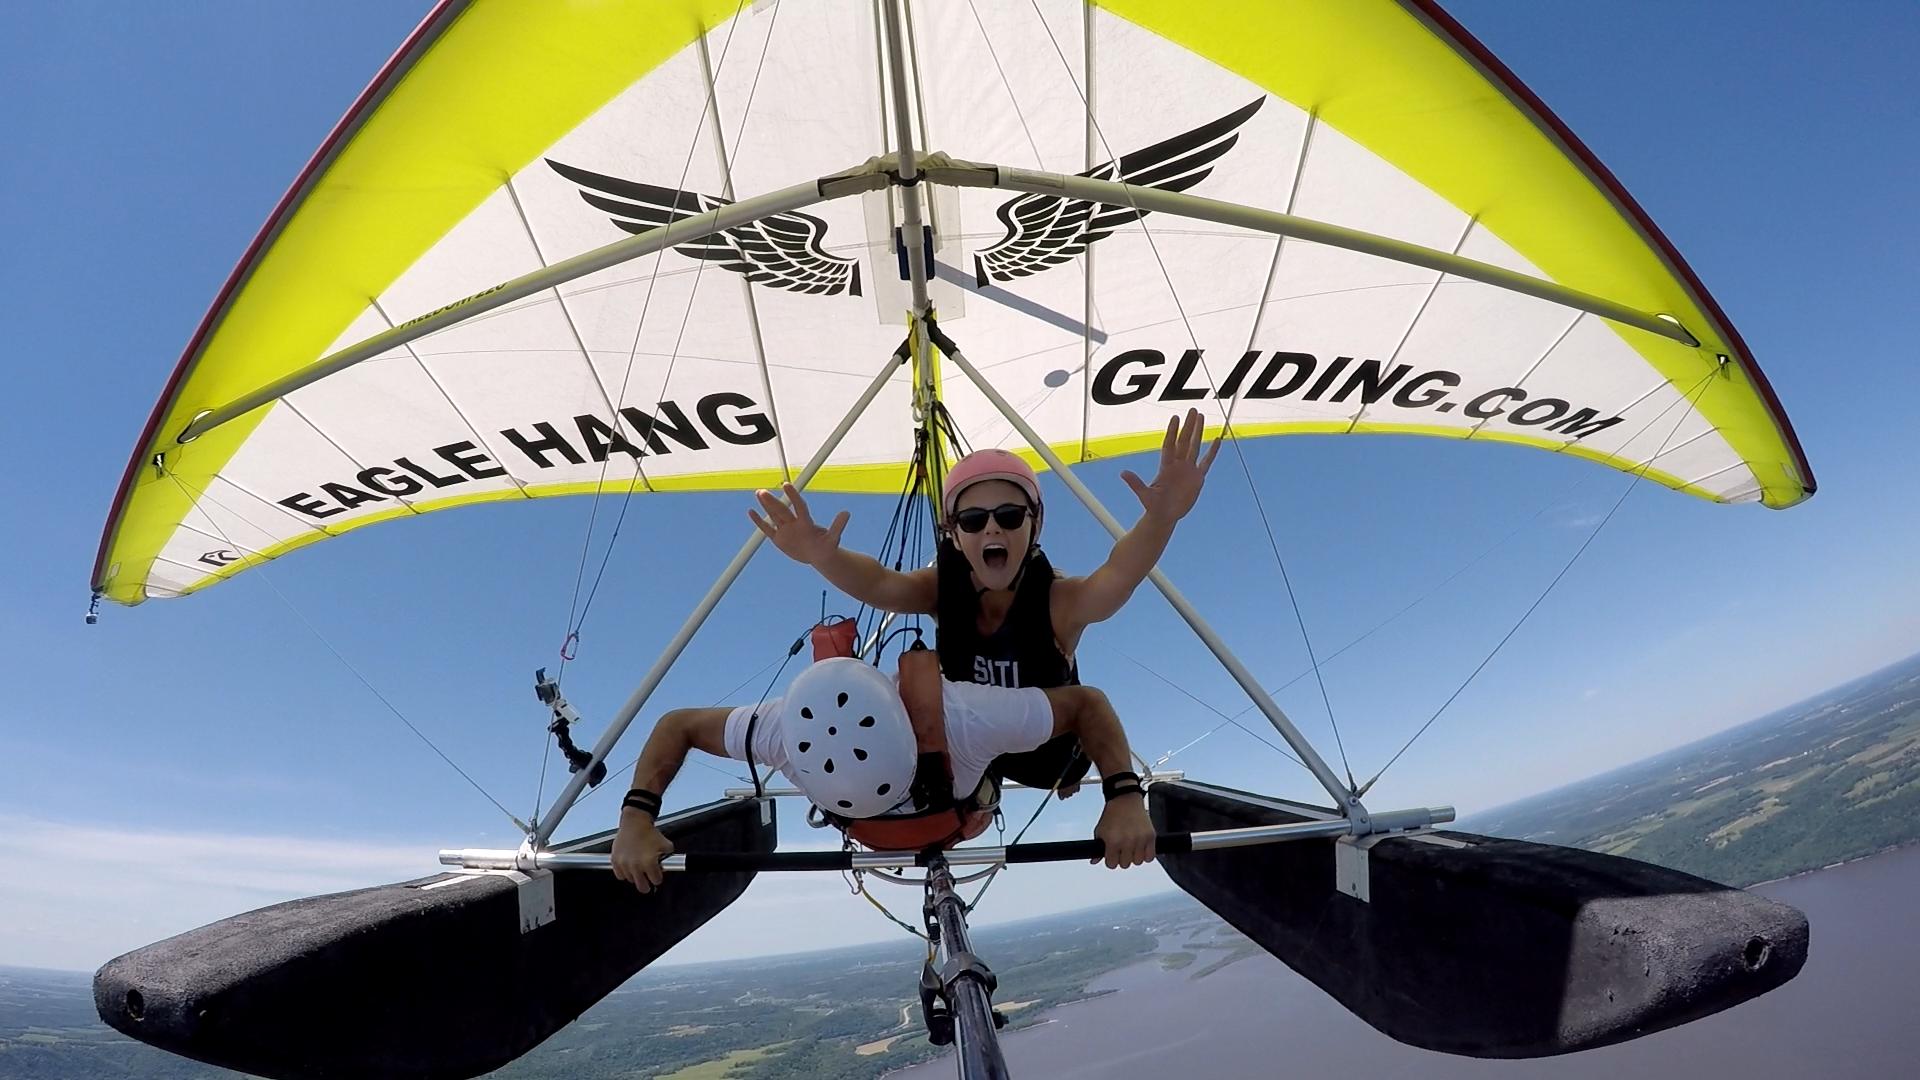 Eagle Hang Gliding - Outdoor Recreational Activities